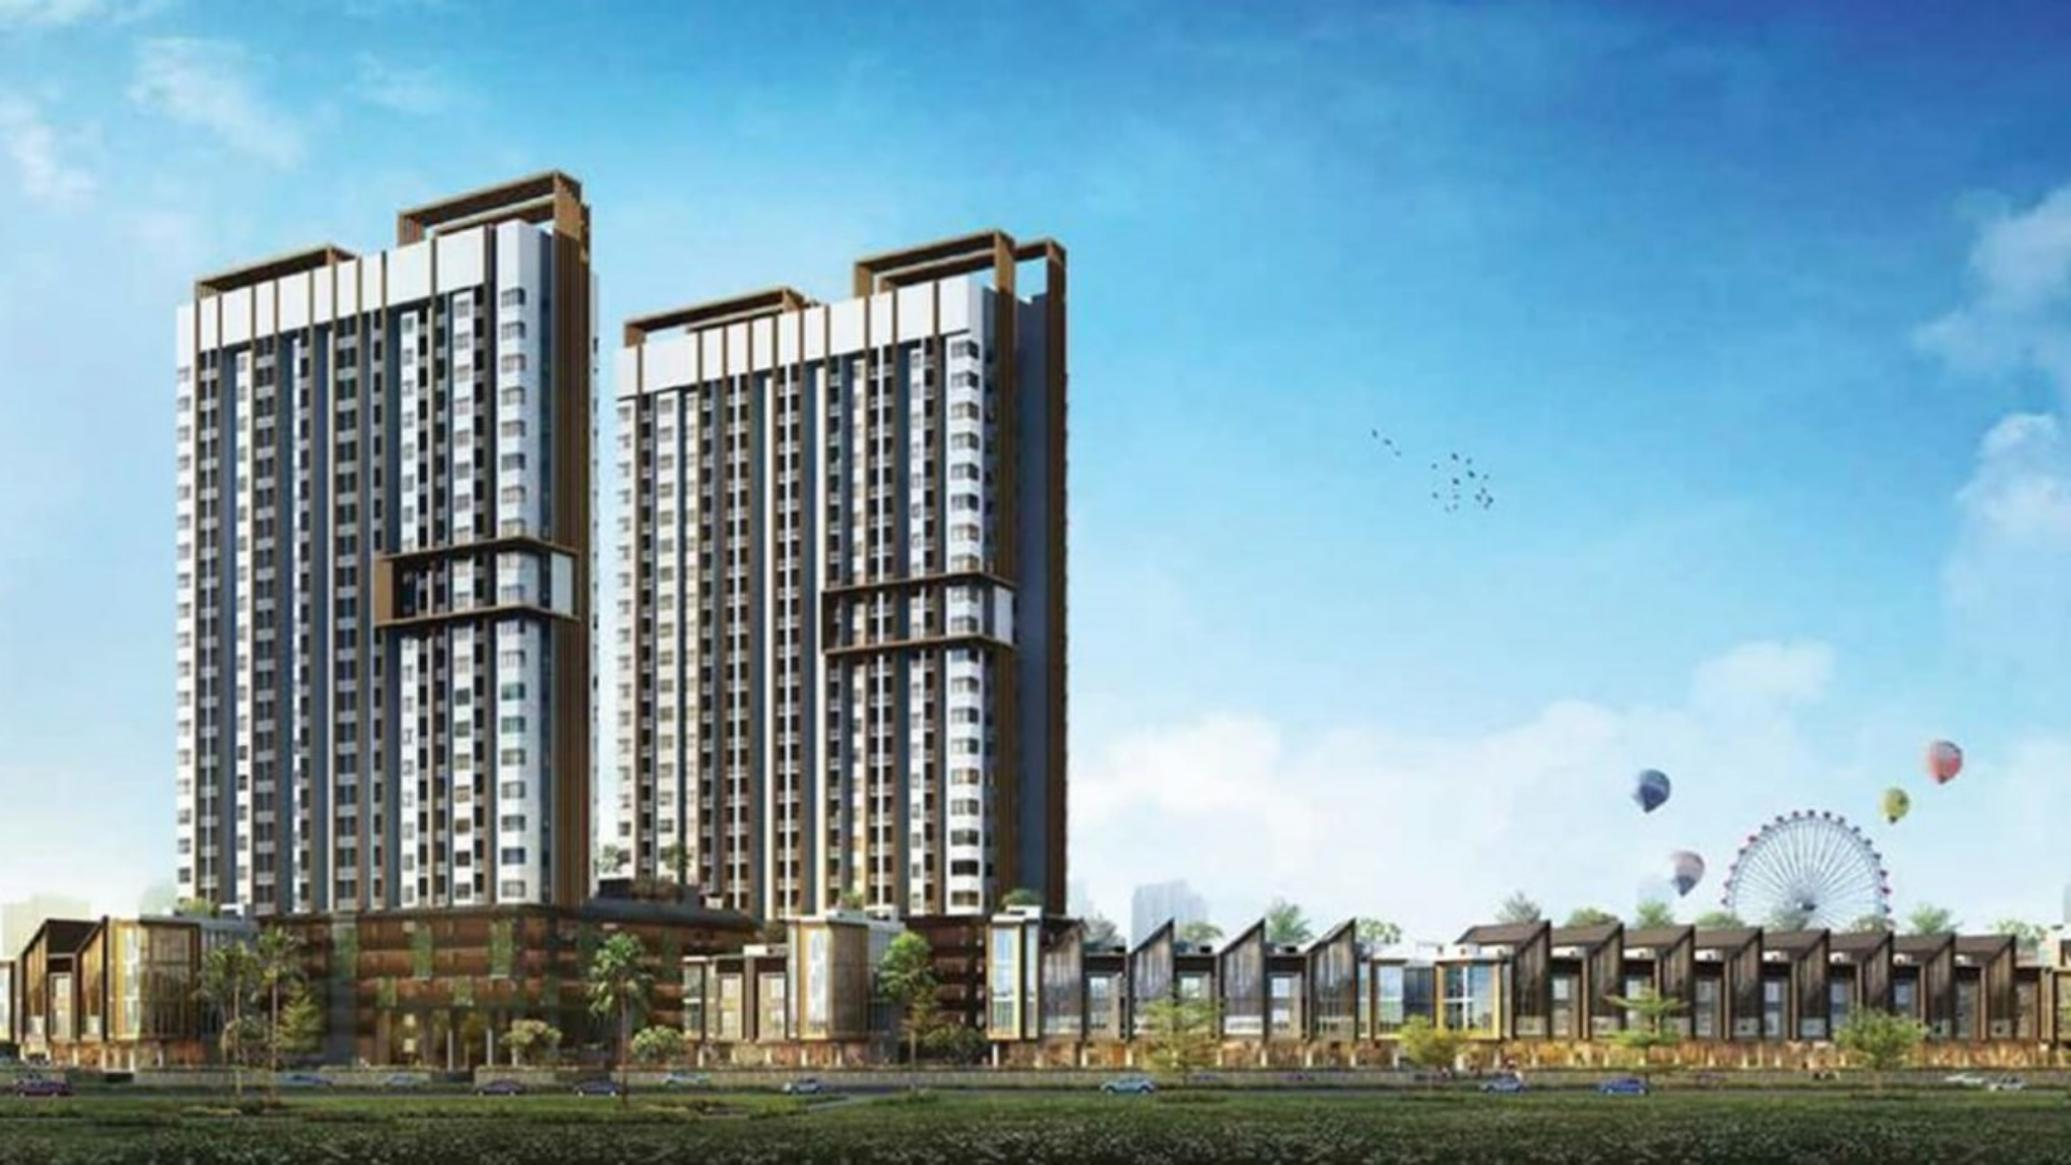 Cleon Park Apartment